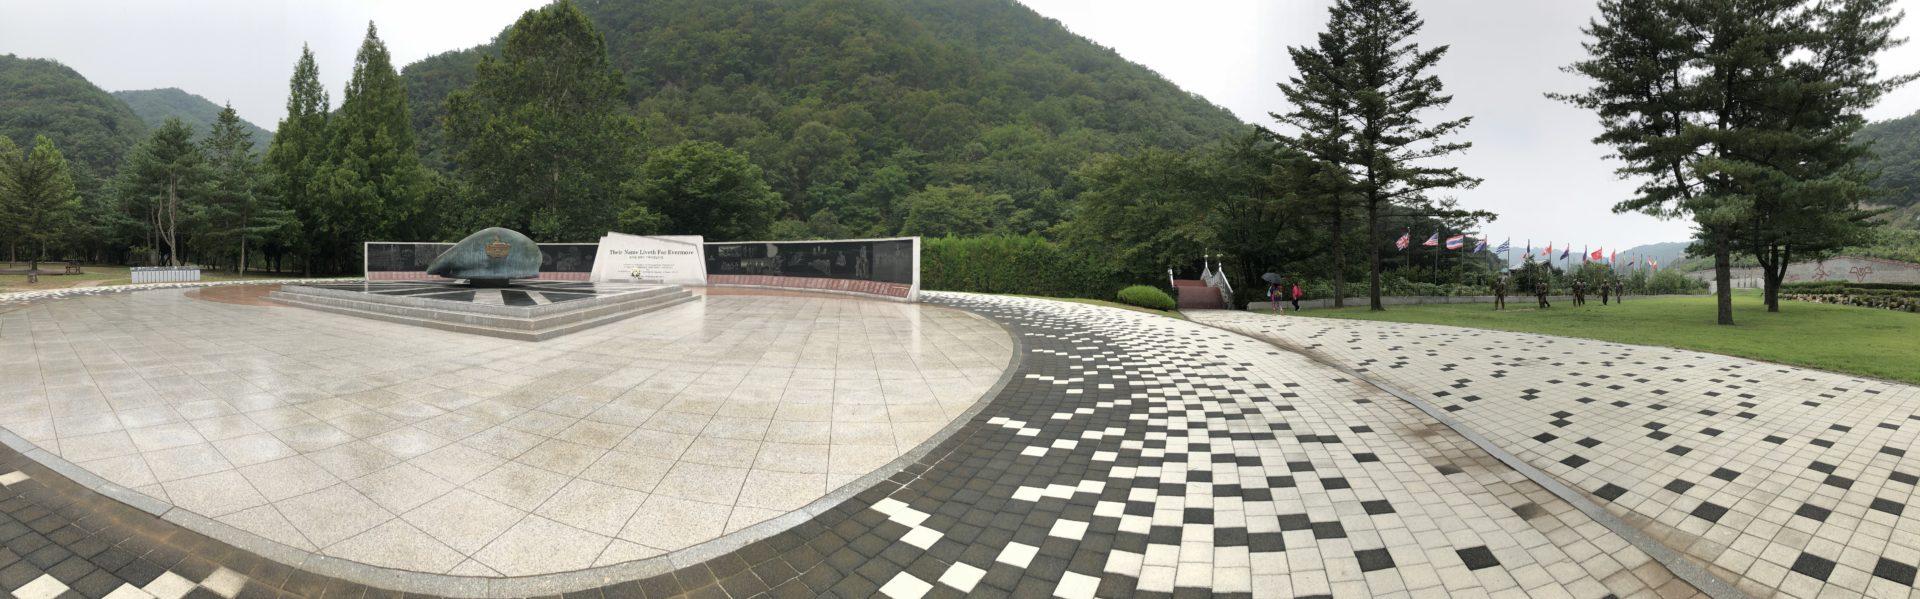 Jeokseong-myeon